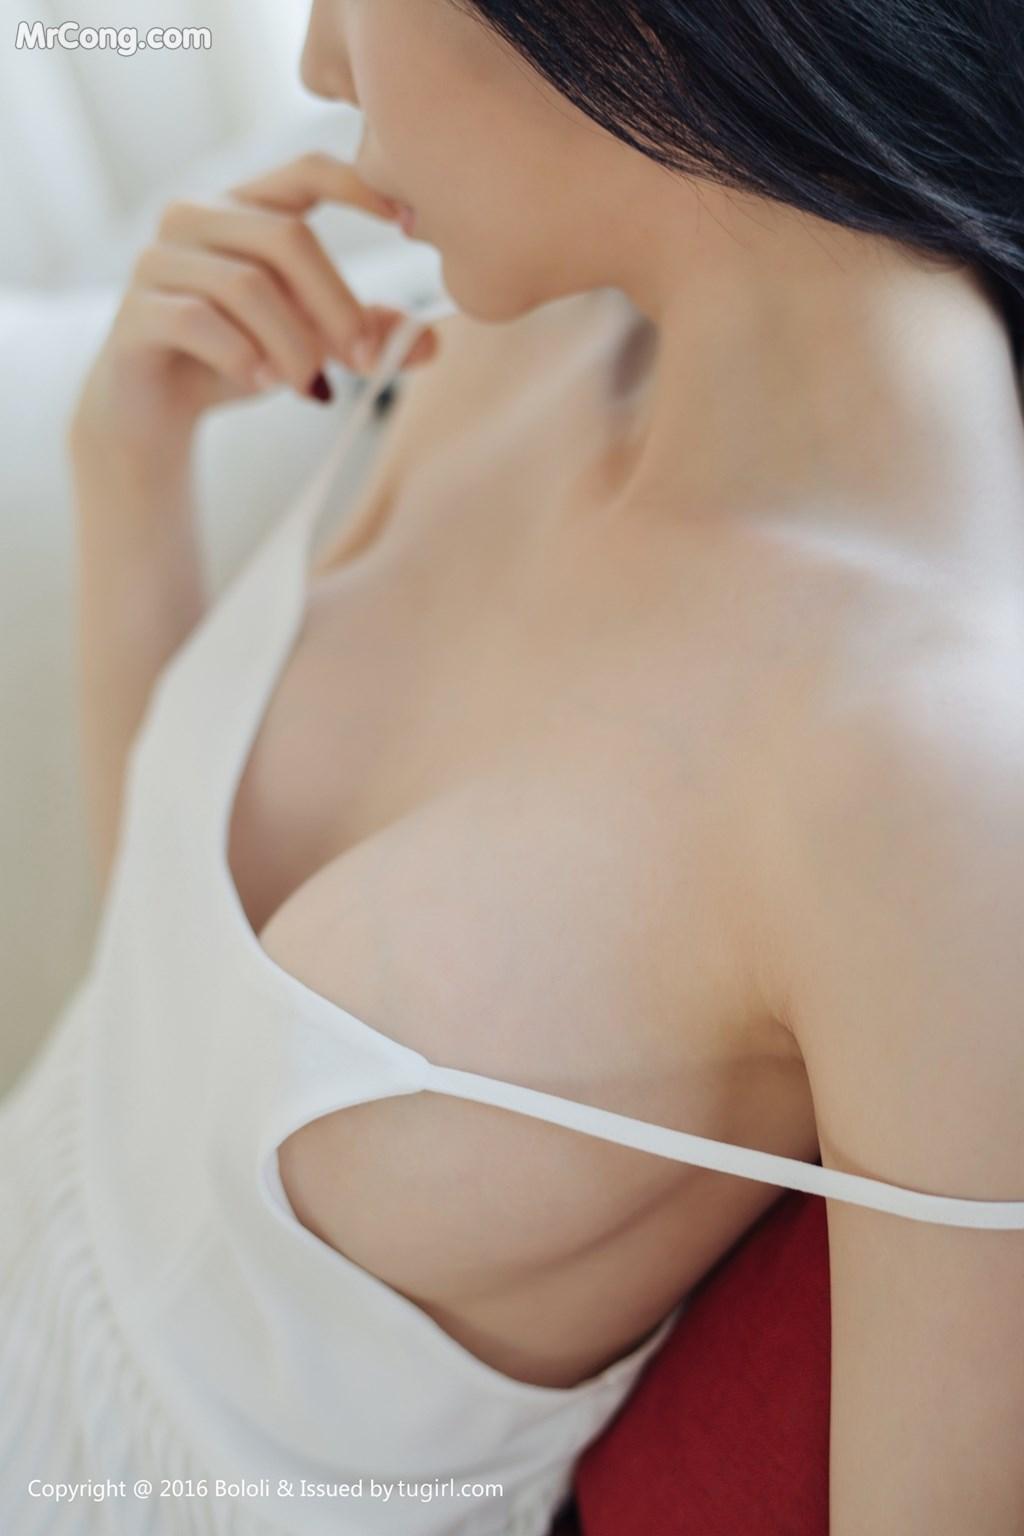 Image BoLoli-2017-09-17-Vol.118-Bebe-Kim-MrCong.com-018 in post BoLoli 2017-09-17 Vol.118: Người mẫu Bebe_Kim (48 ảnh)